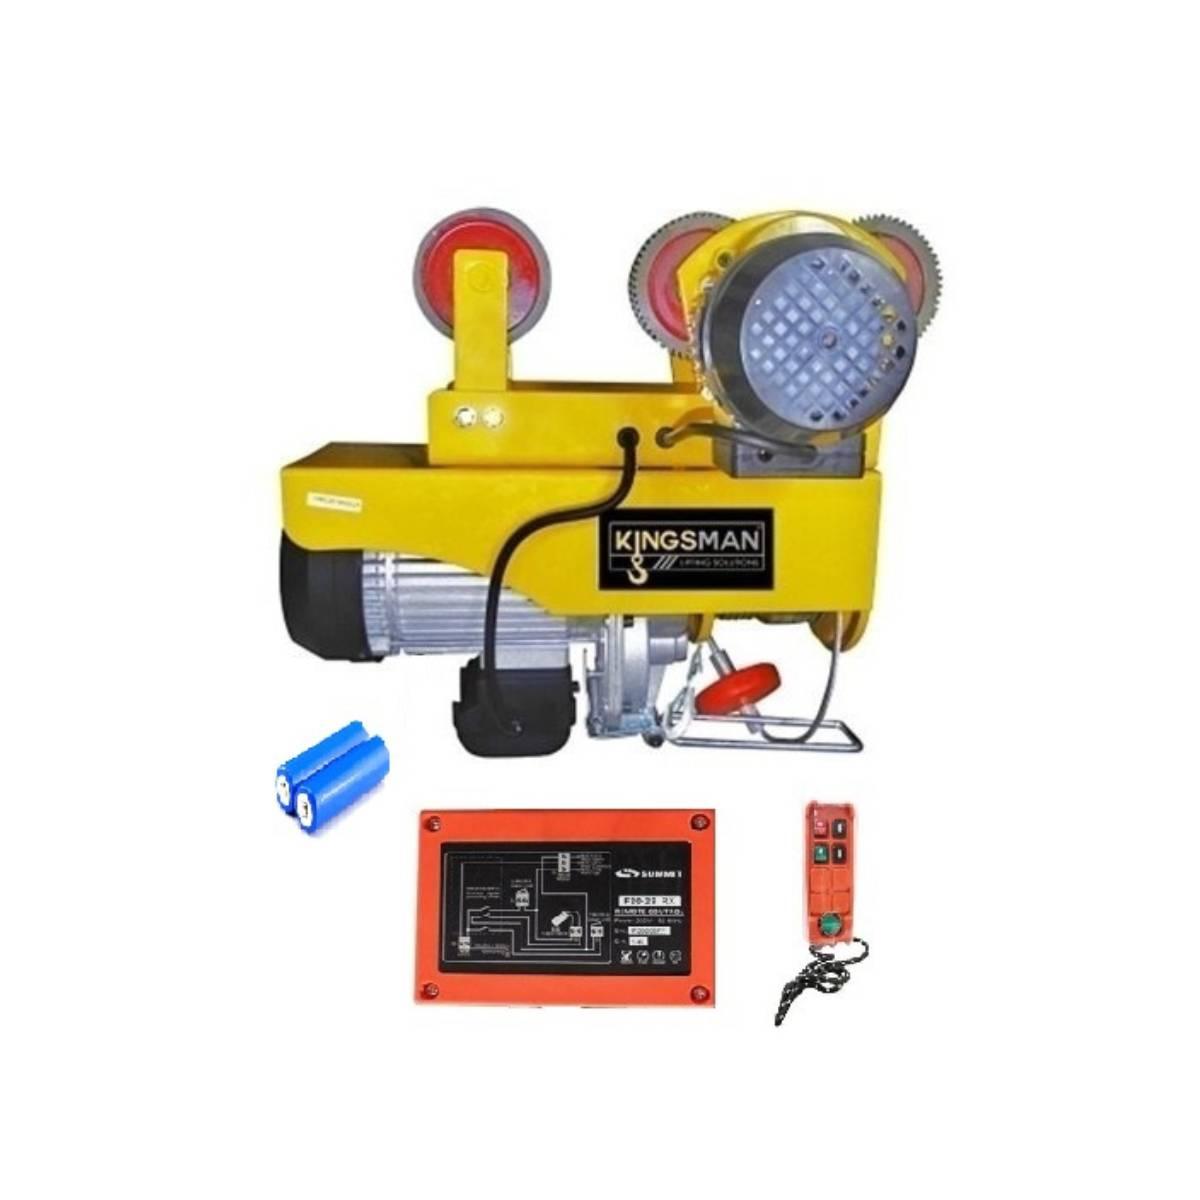 Trole Polipasto Electrico Inalambrico 600 A 990 kg Kingsman